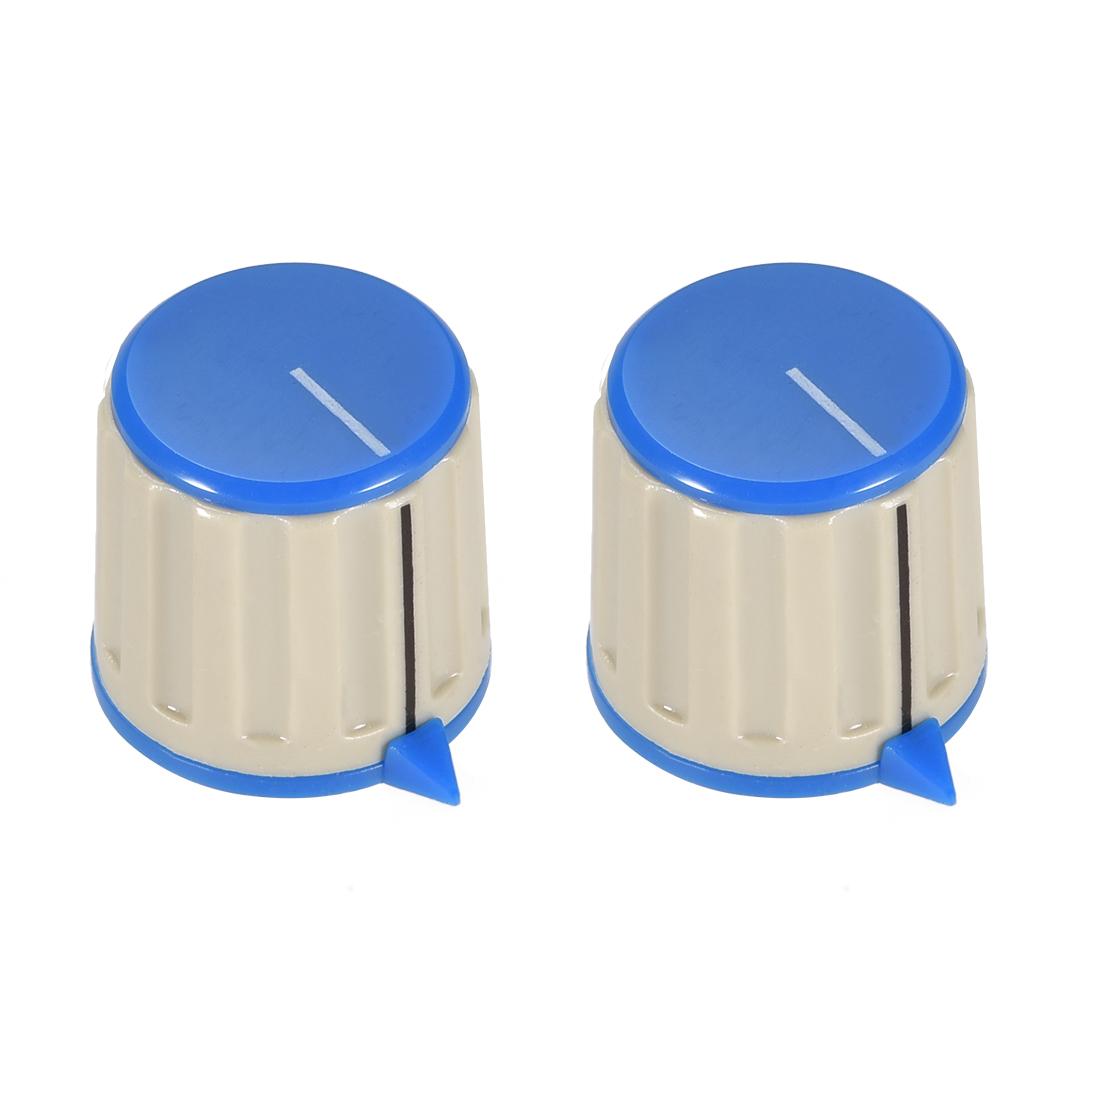 2pcs 6mm Potentiometer Control Knobs For Guitar Volume Tone Knobs Grey Blue